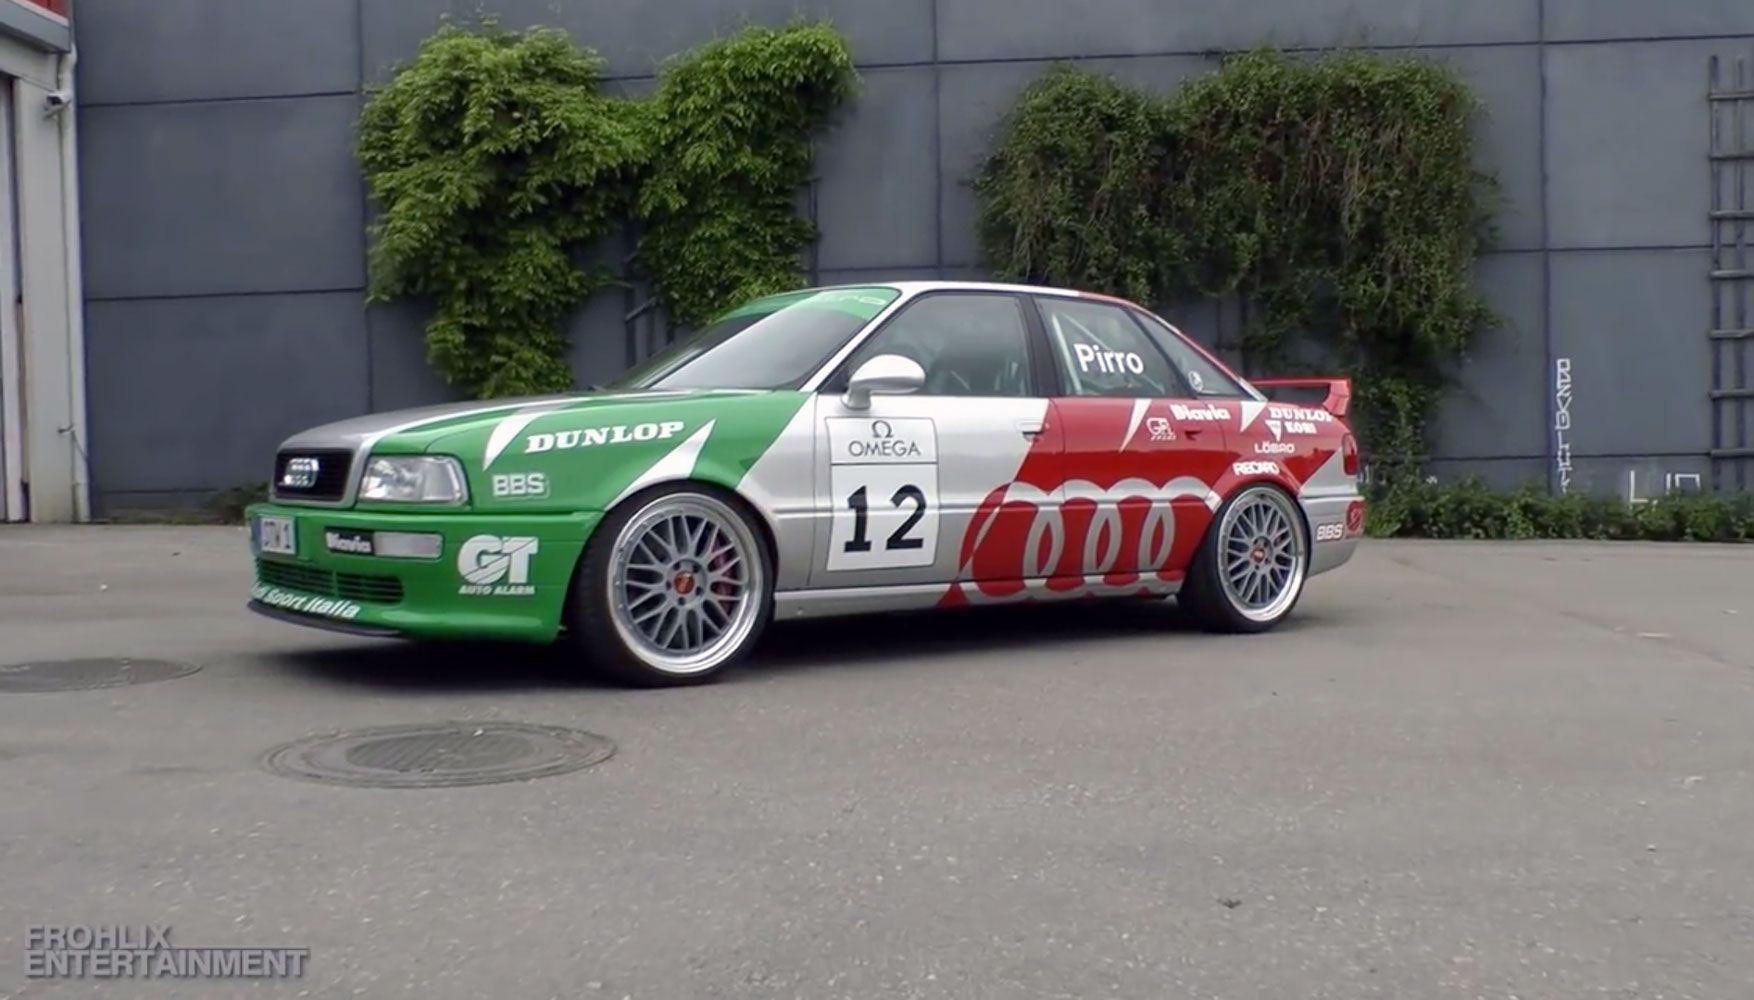 720 Ps Im Audi 80 Competition Audi Nsu Audi Cars Und Audi Quattro